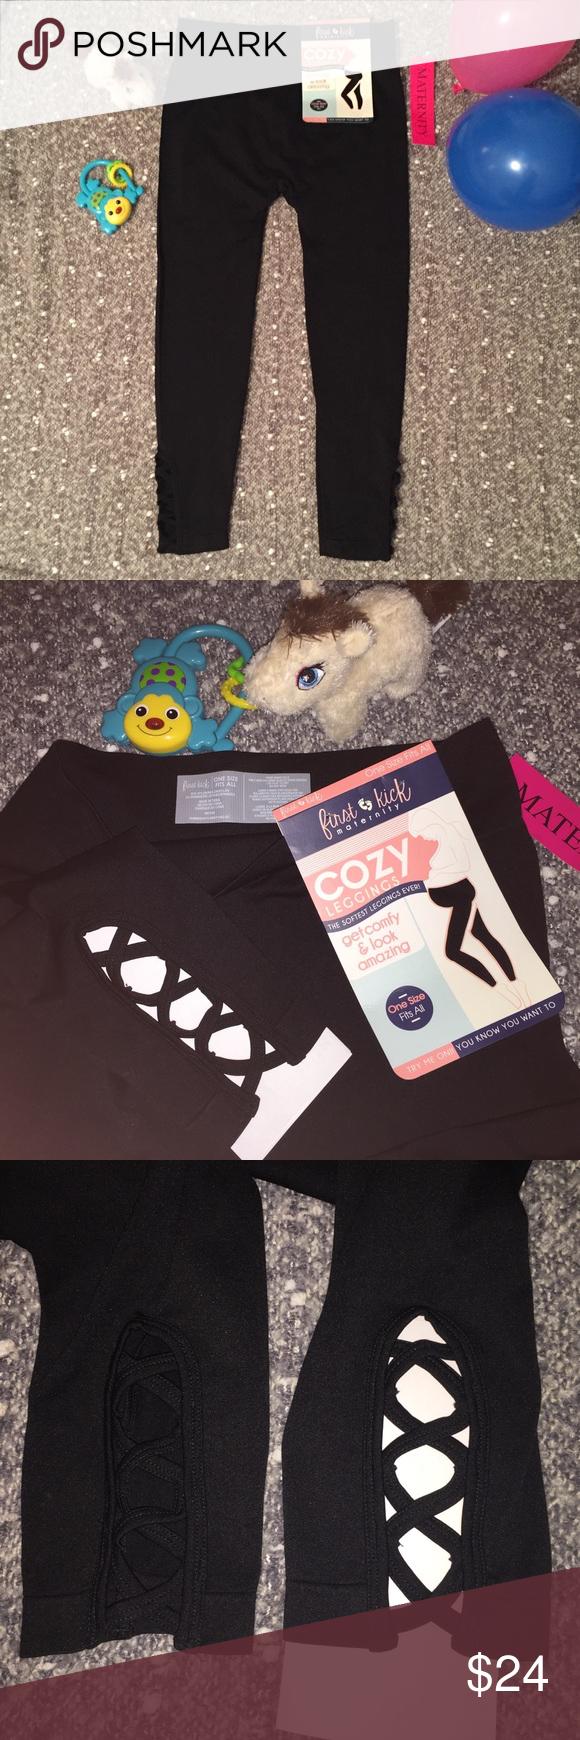 de300e5d4728c Maternity Black Leggings Pants Criss Cross NWT First Kick Maternity Cozy  Leggings 95% Nylon 5